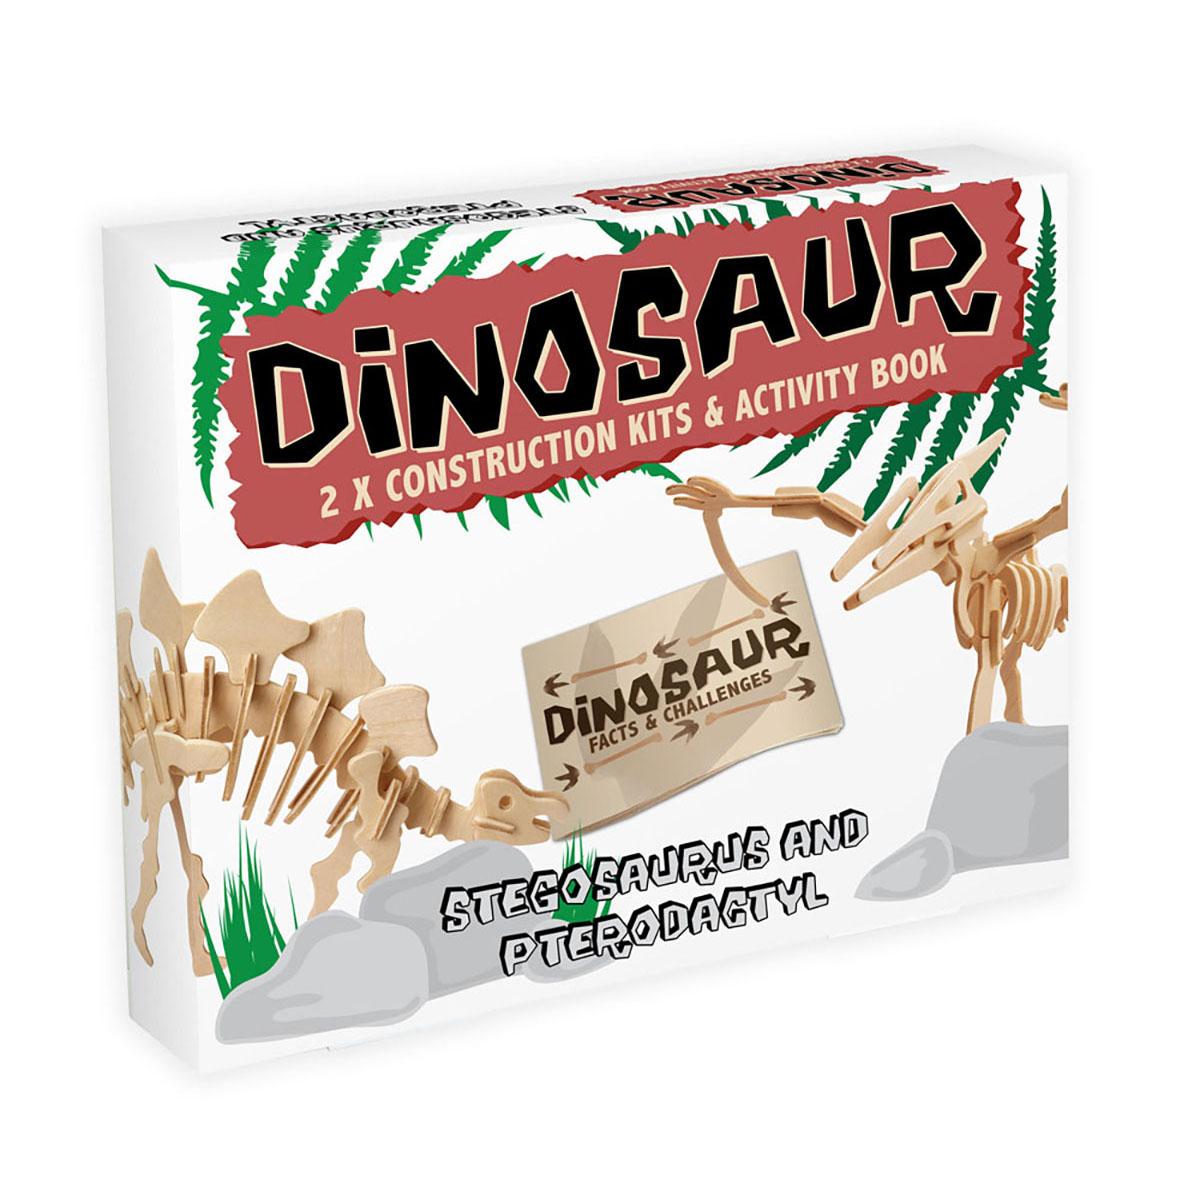 Dinosaur - Stegosaurus and Pterodactyl